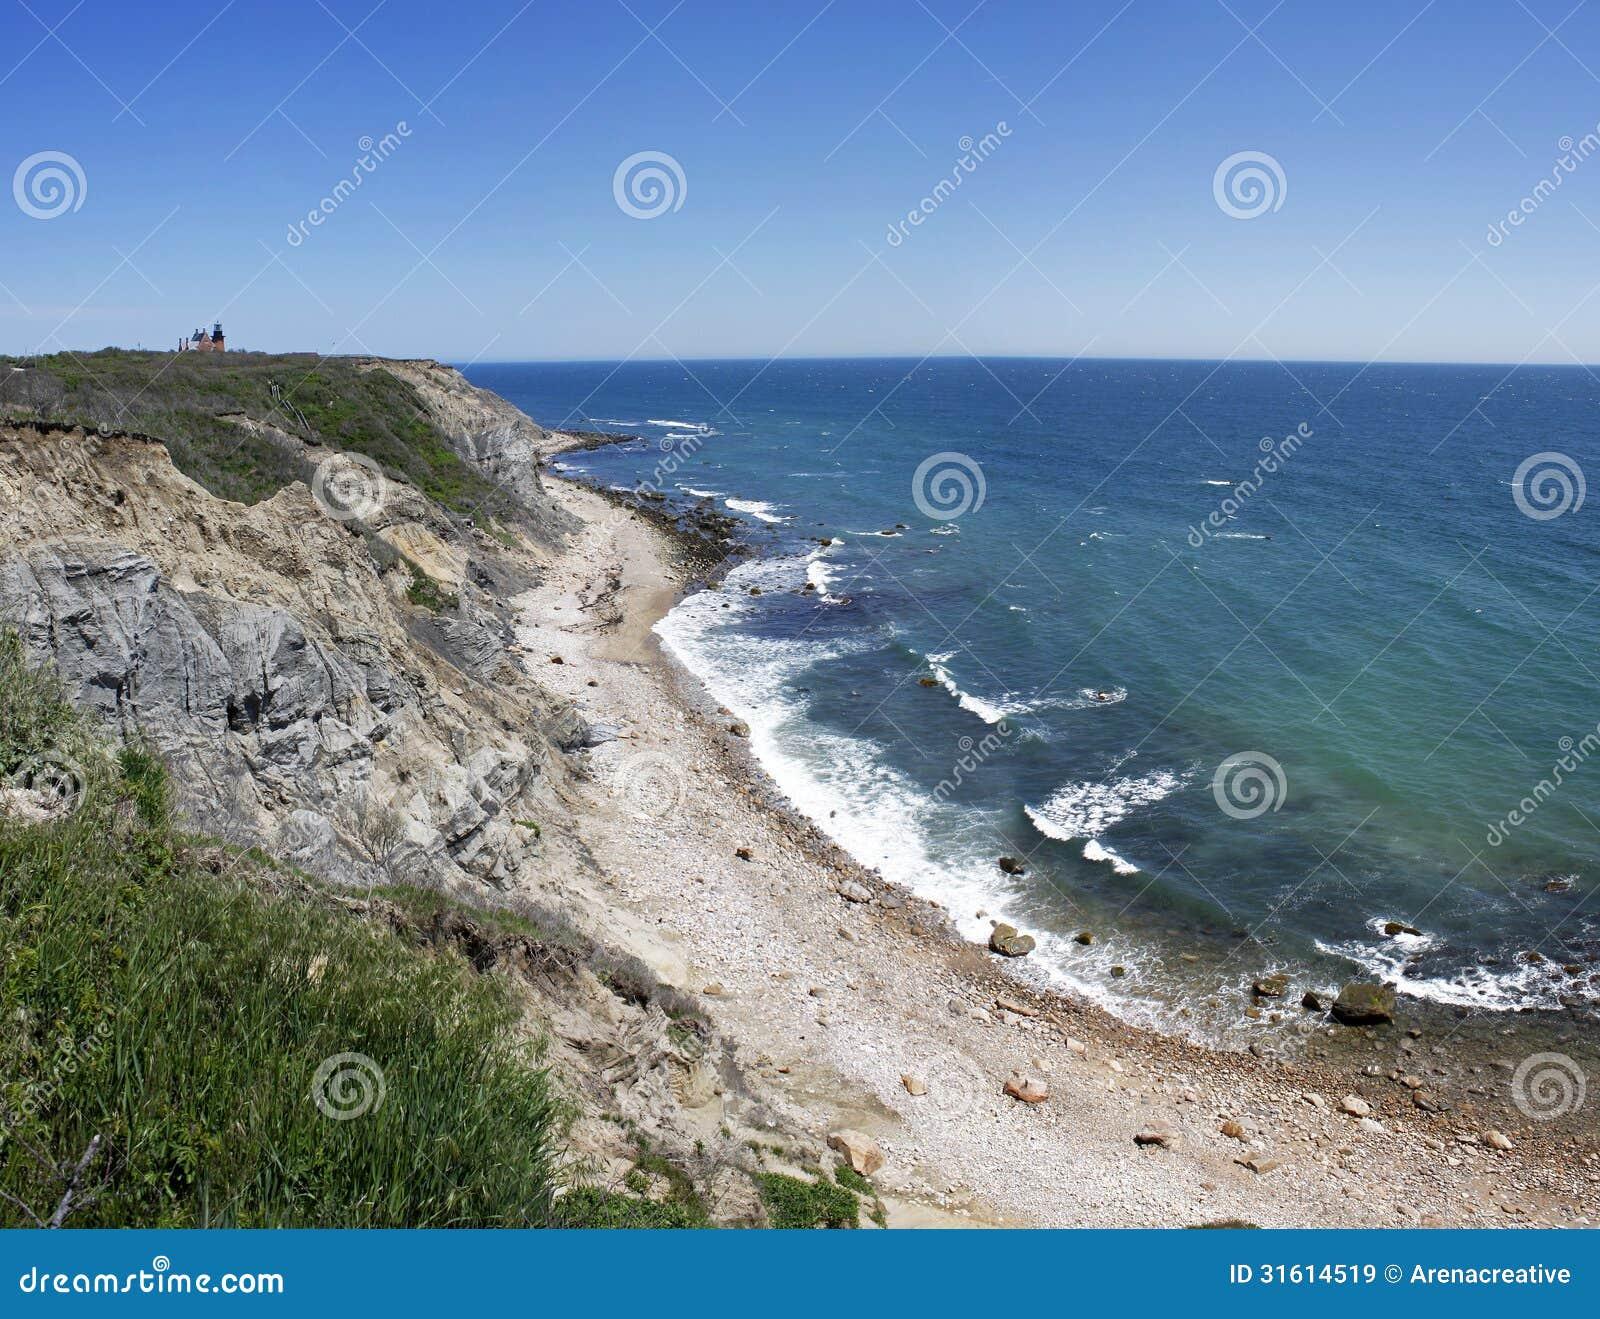 Block Island: Mohegan Bluffs Block Island RI Royalty Free Stock Images